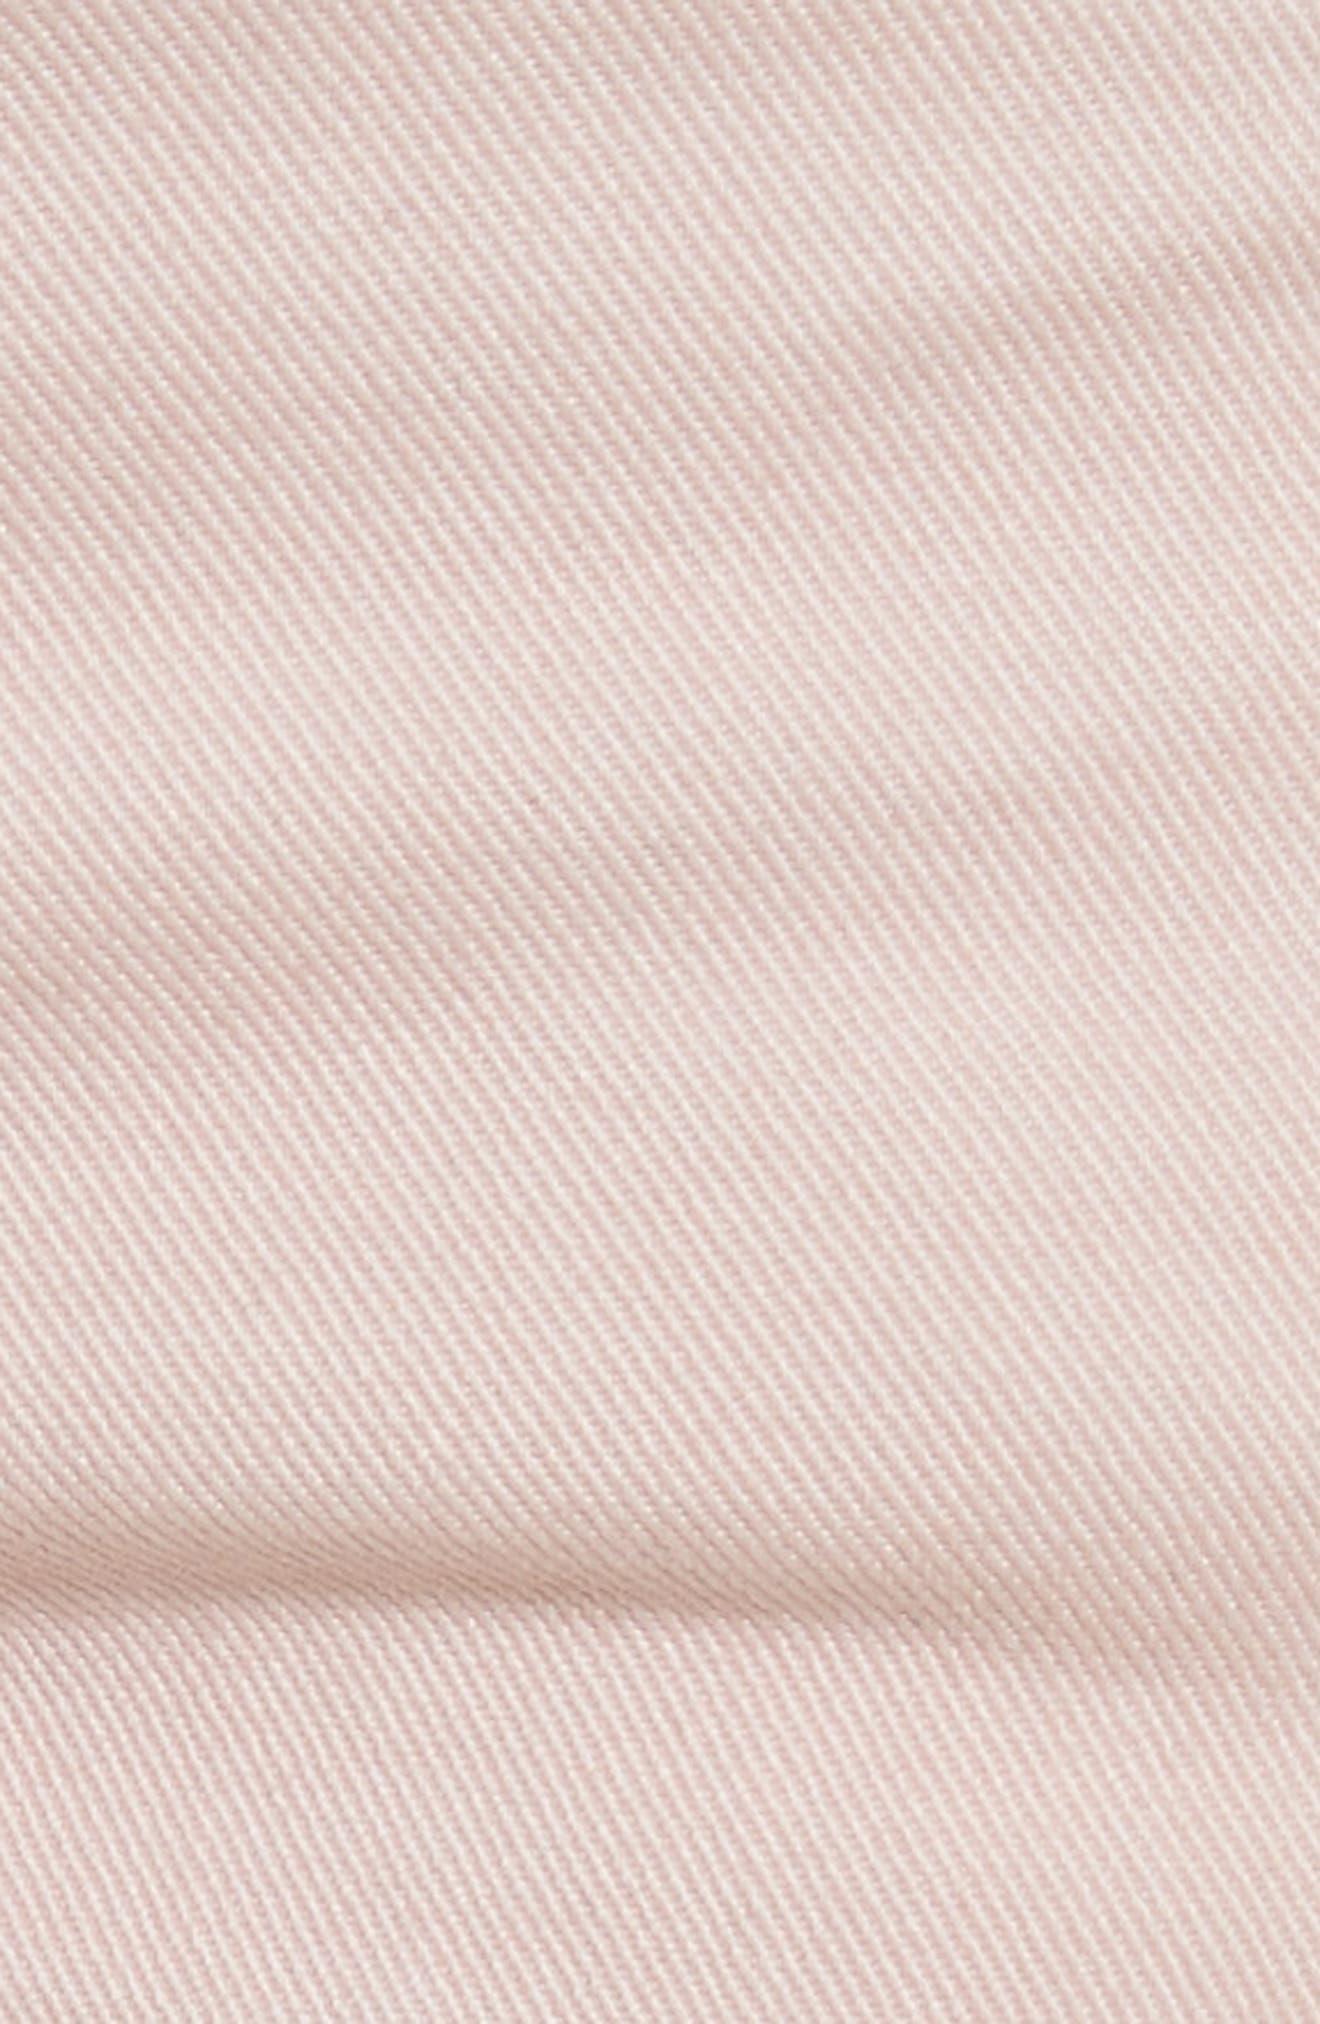 Alternate Image 5  - rag & bone/JEAN Justine High Waist Trouser Jeans (Blush Twill)